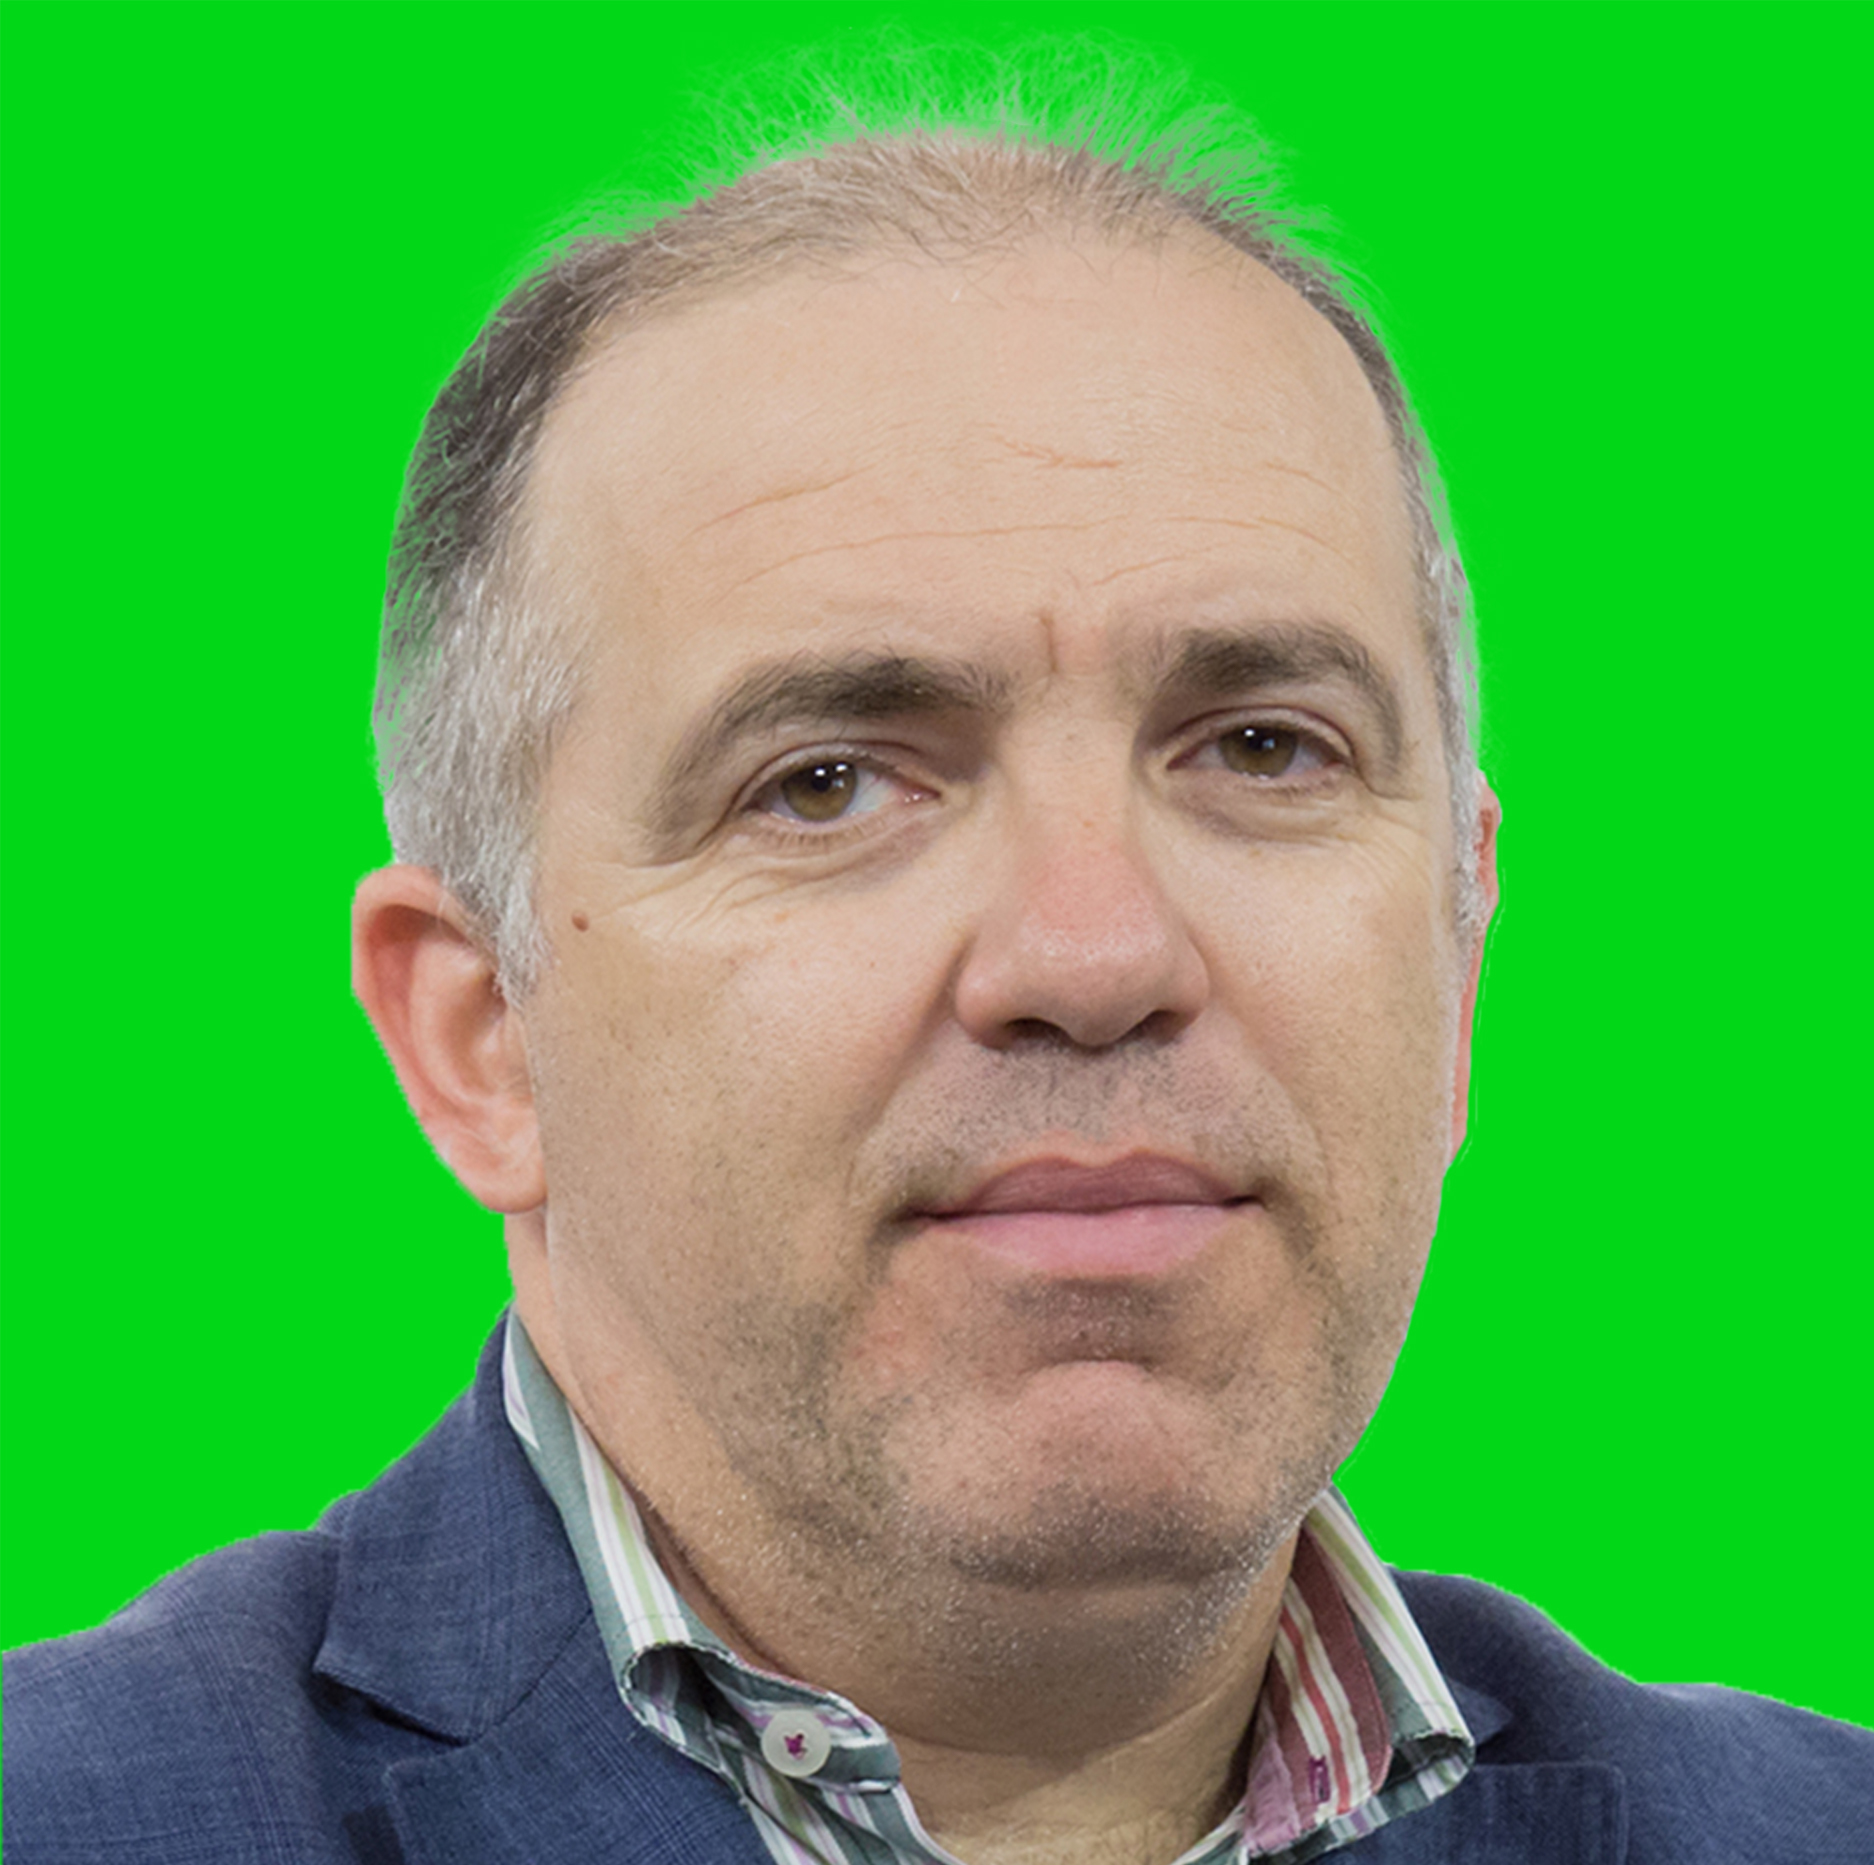 Imagem de José M. Lúcio